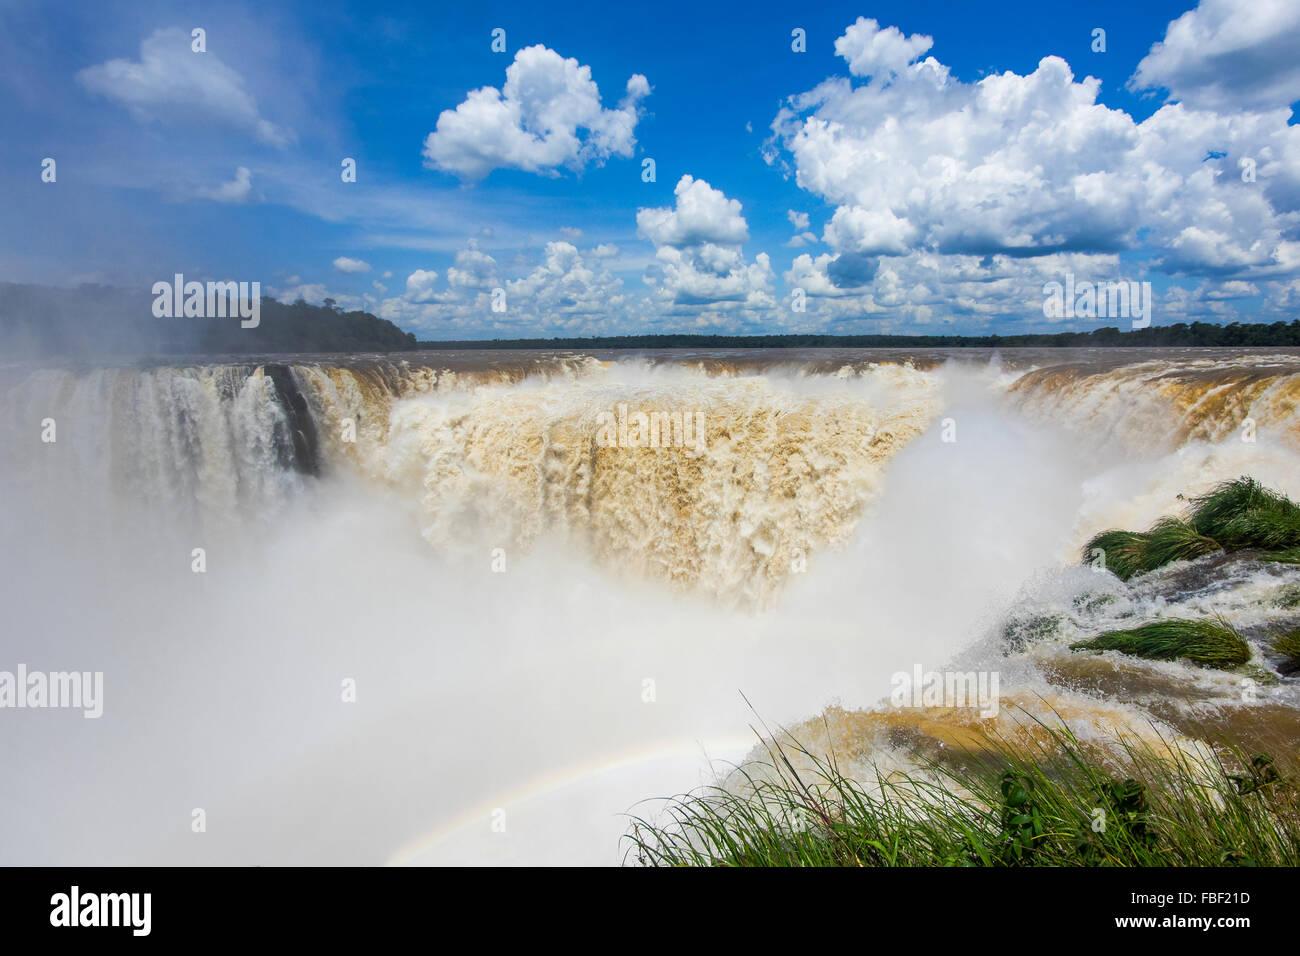 View of Devil's Throat (Garganta del Diablo), the largest cascade at Iguazu Falls, on the border of Argentina - Stock Image